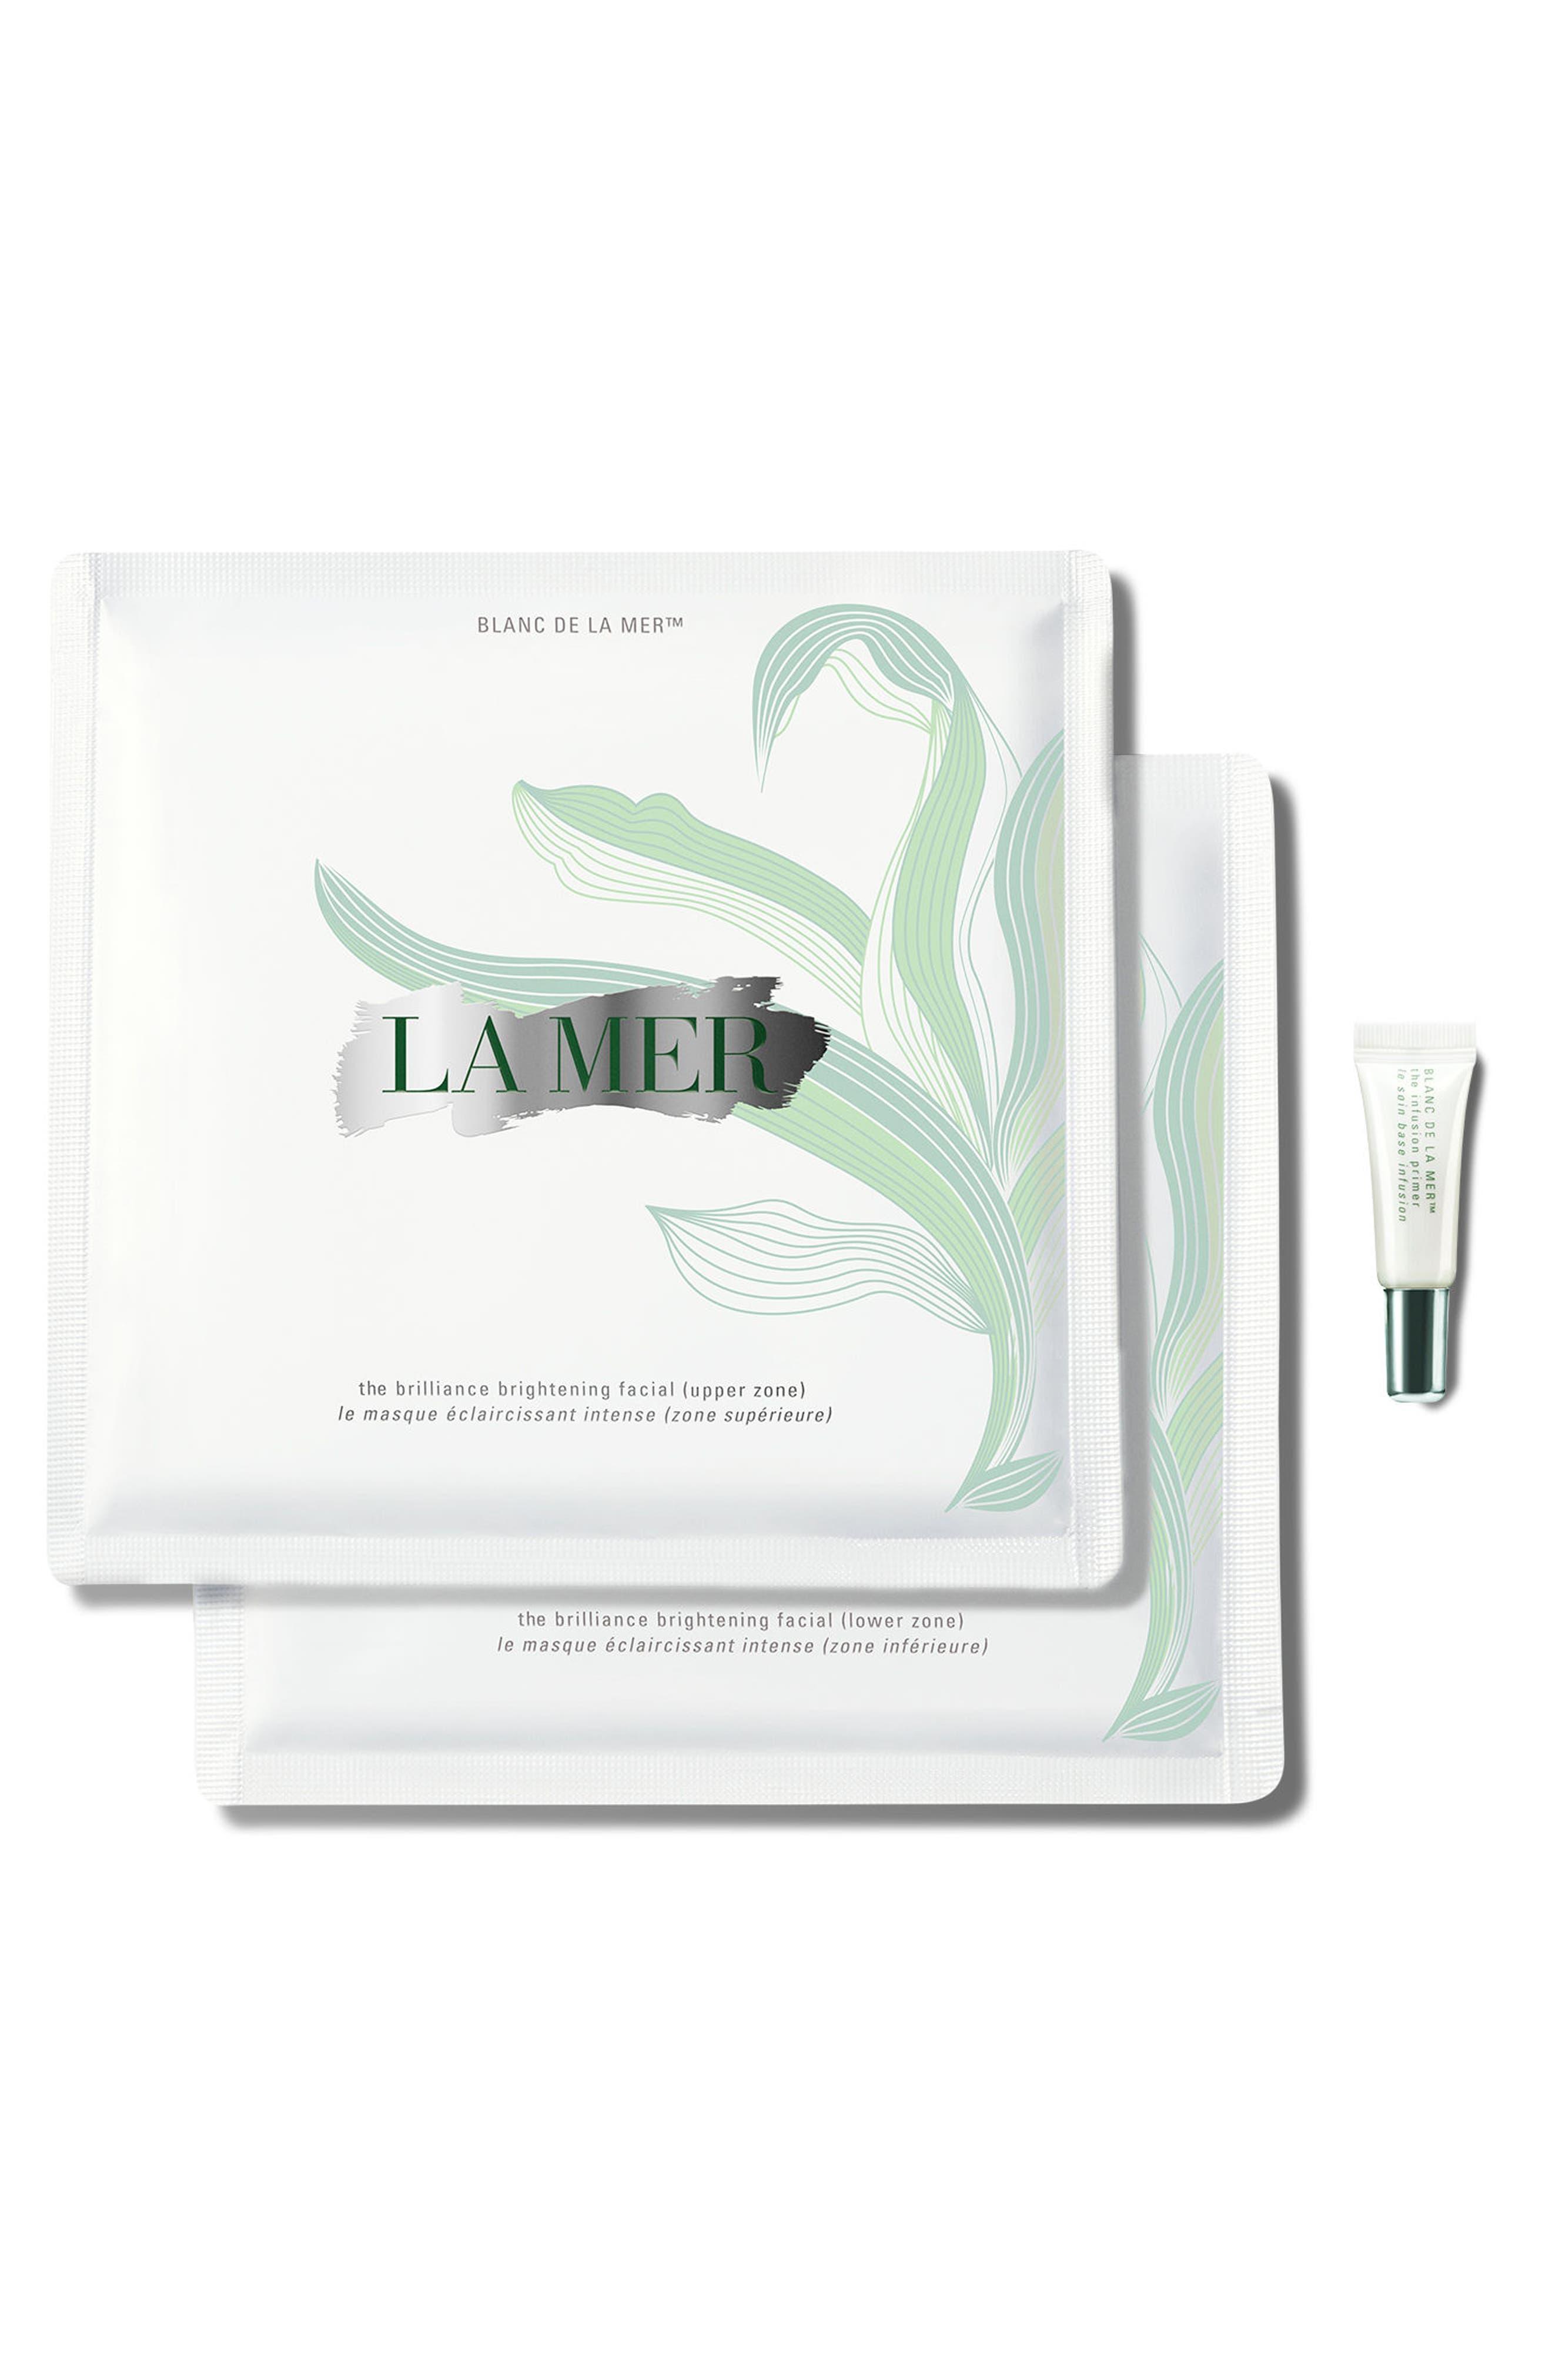 La Mer The Brilliance Brightening Facial Kit